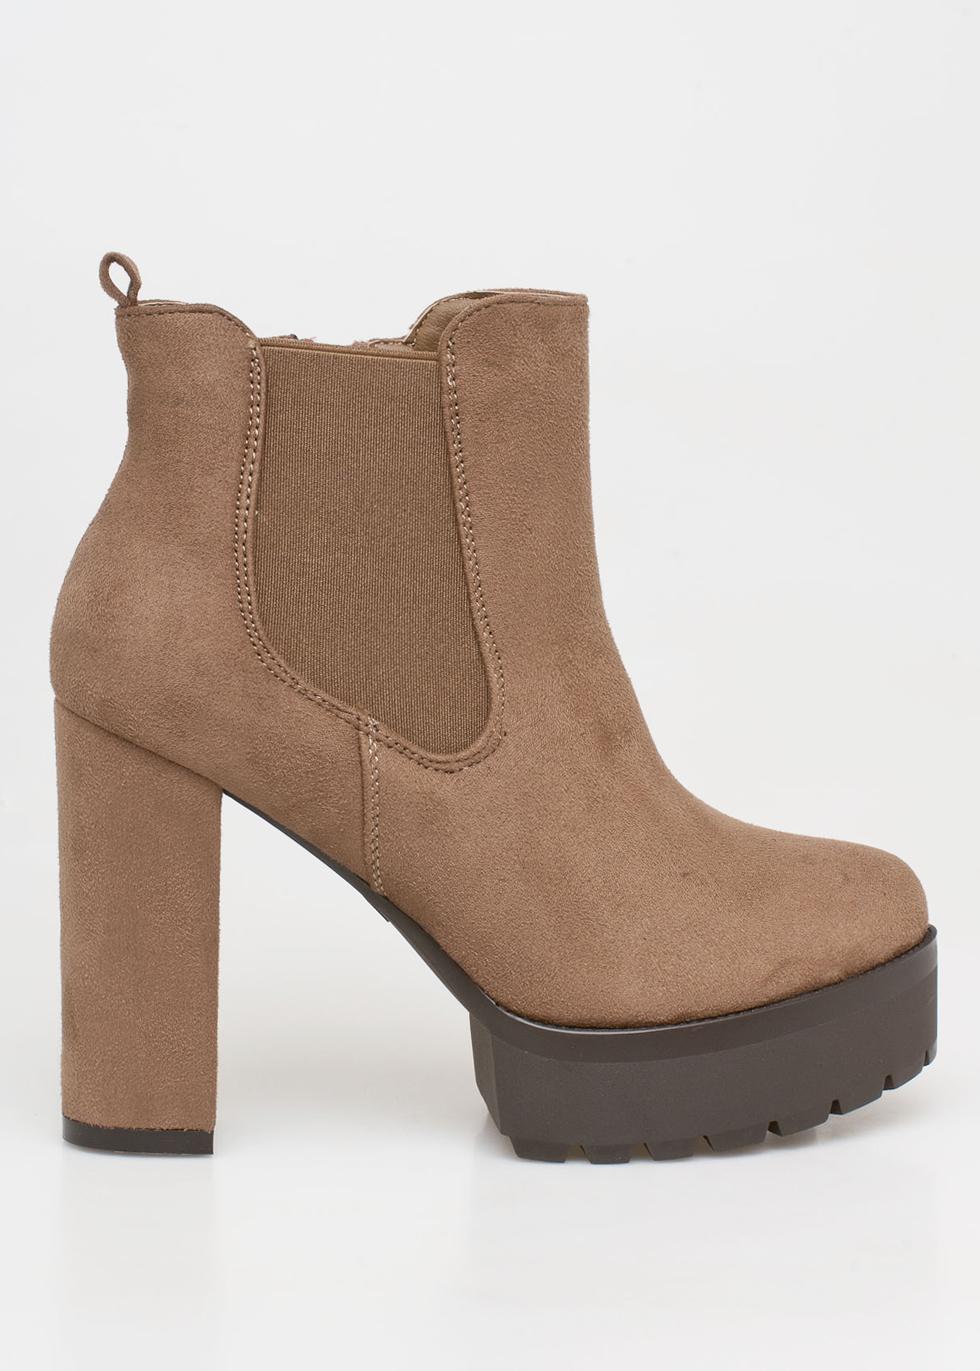 Brooke chelsea boot, μπεζ μποτάκια